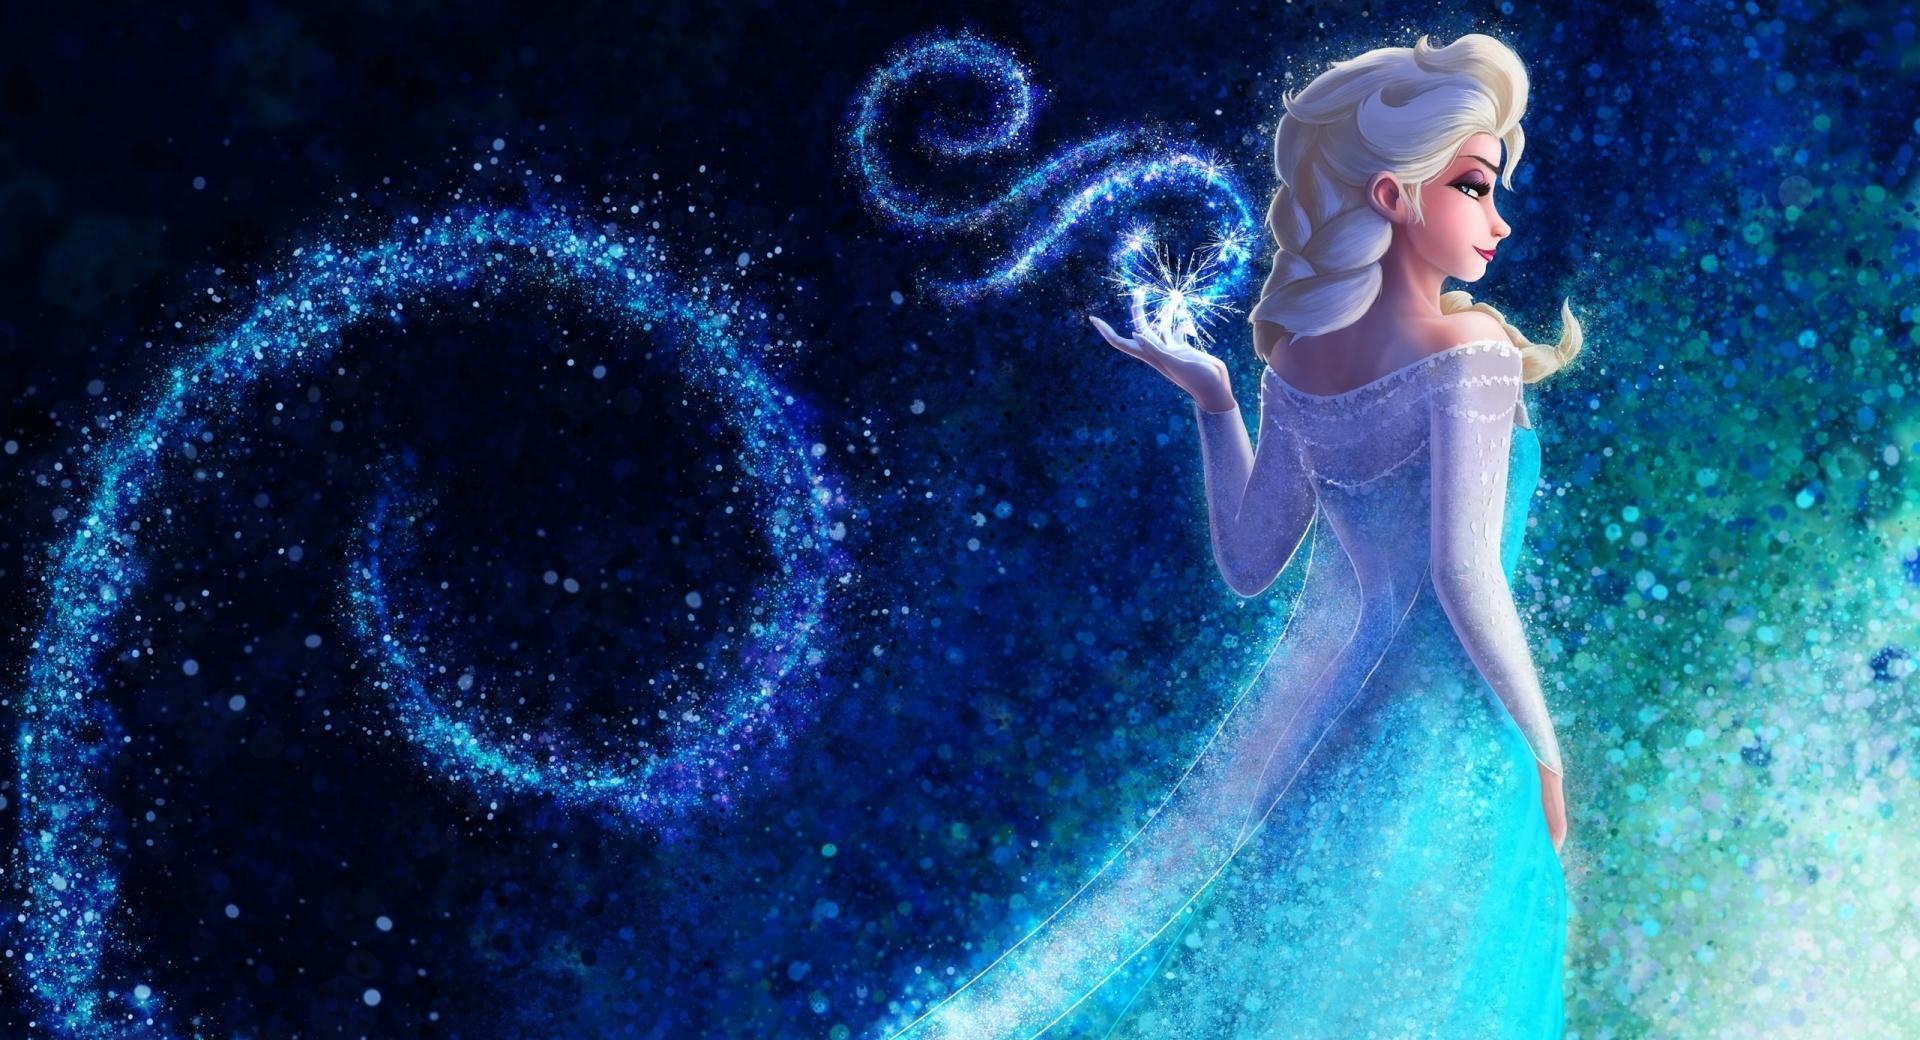 Queen Elsa Frozen hand snowflakes concept art wallpapers HD quality